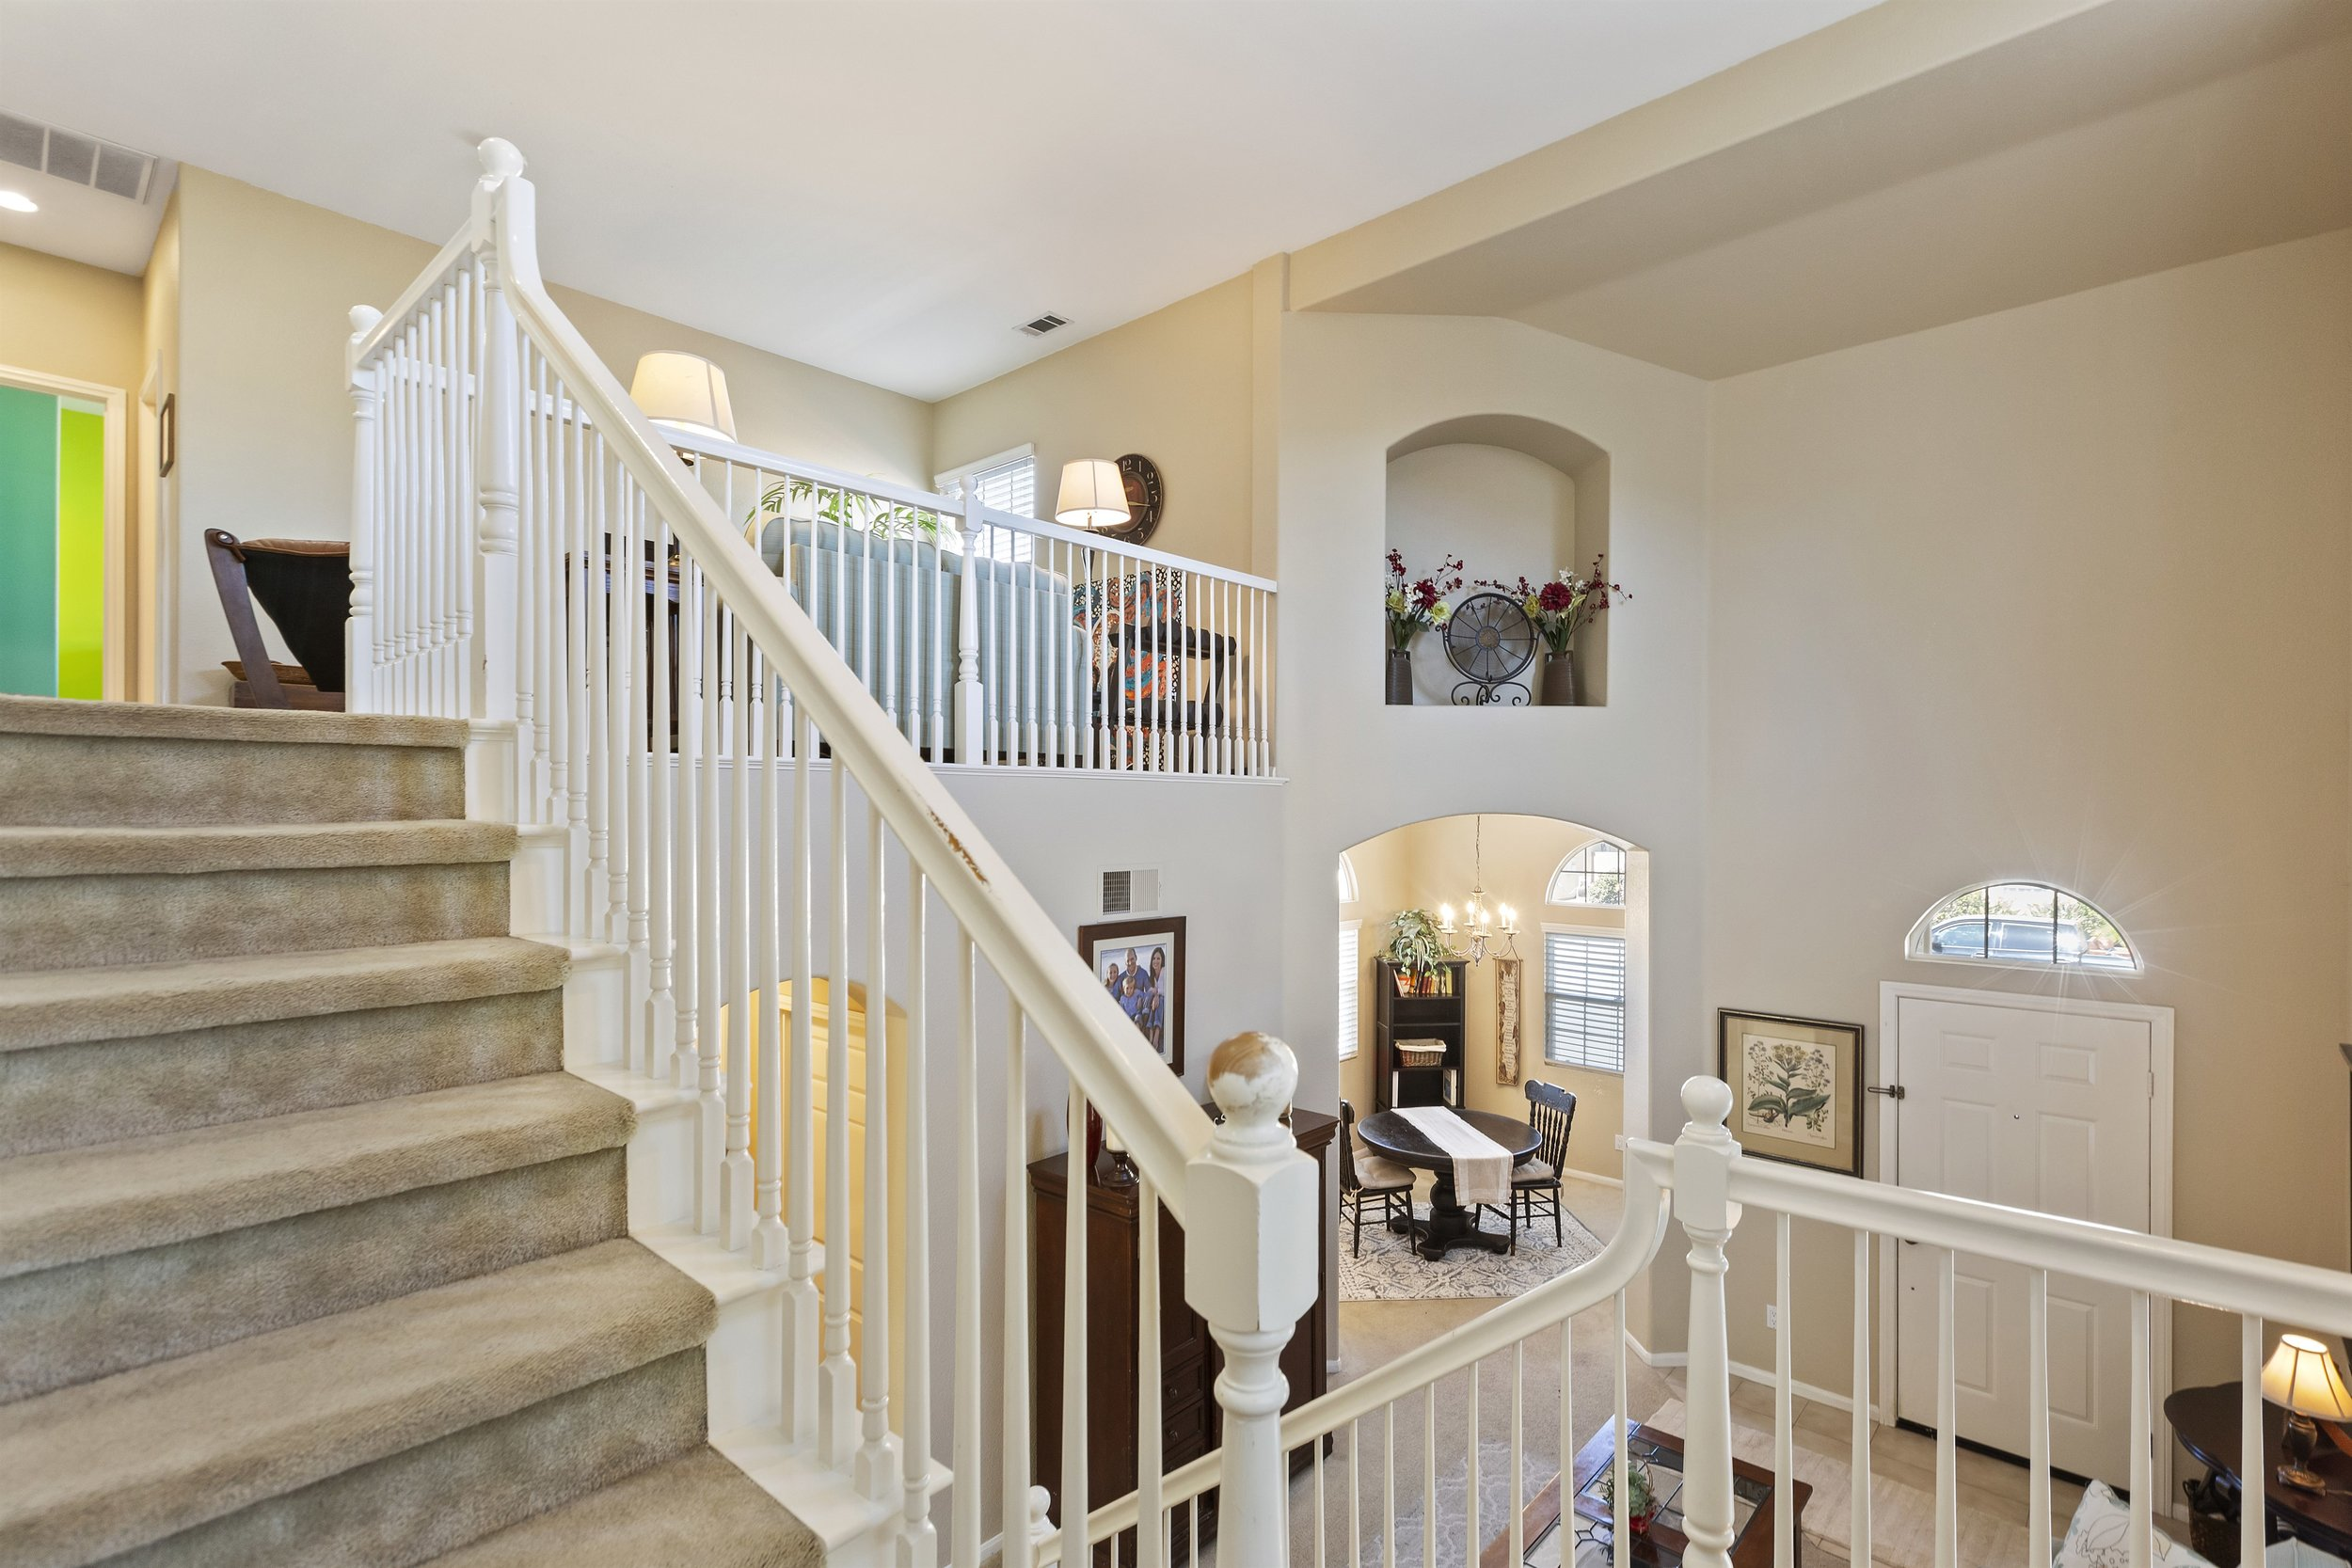 018_Staircase.jpg